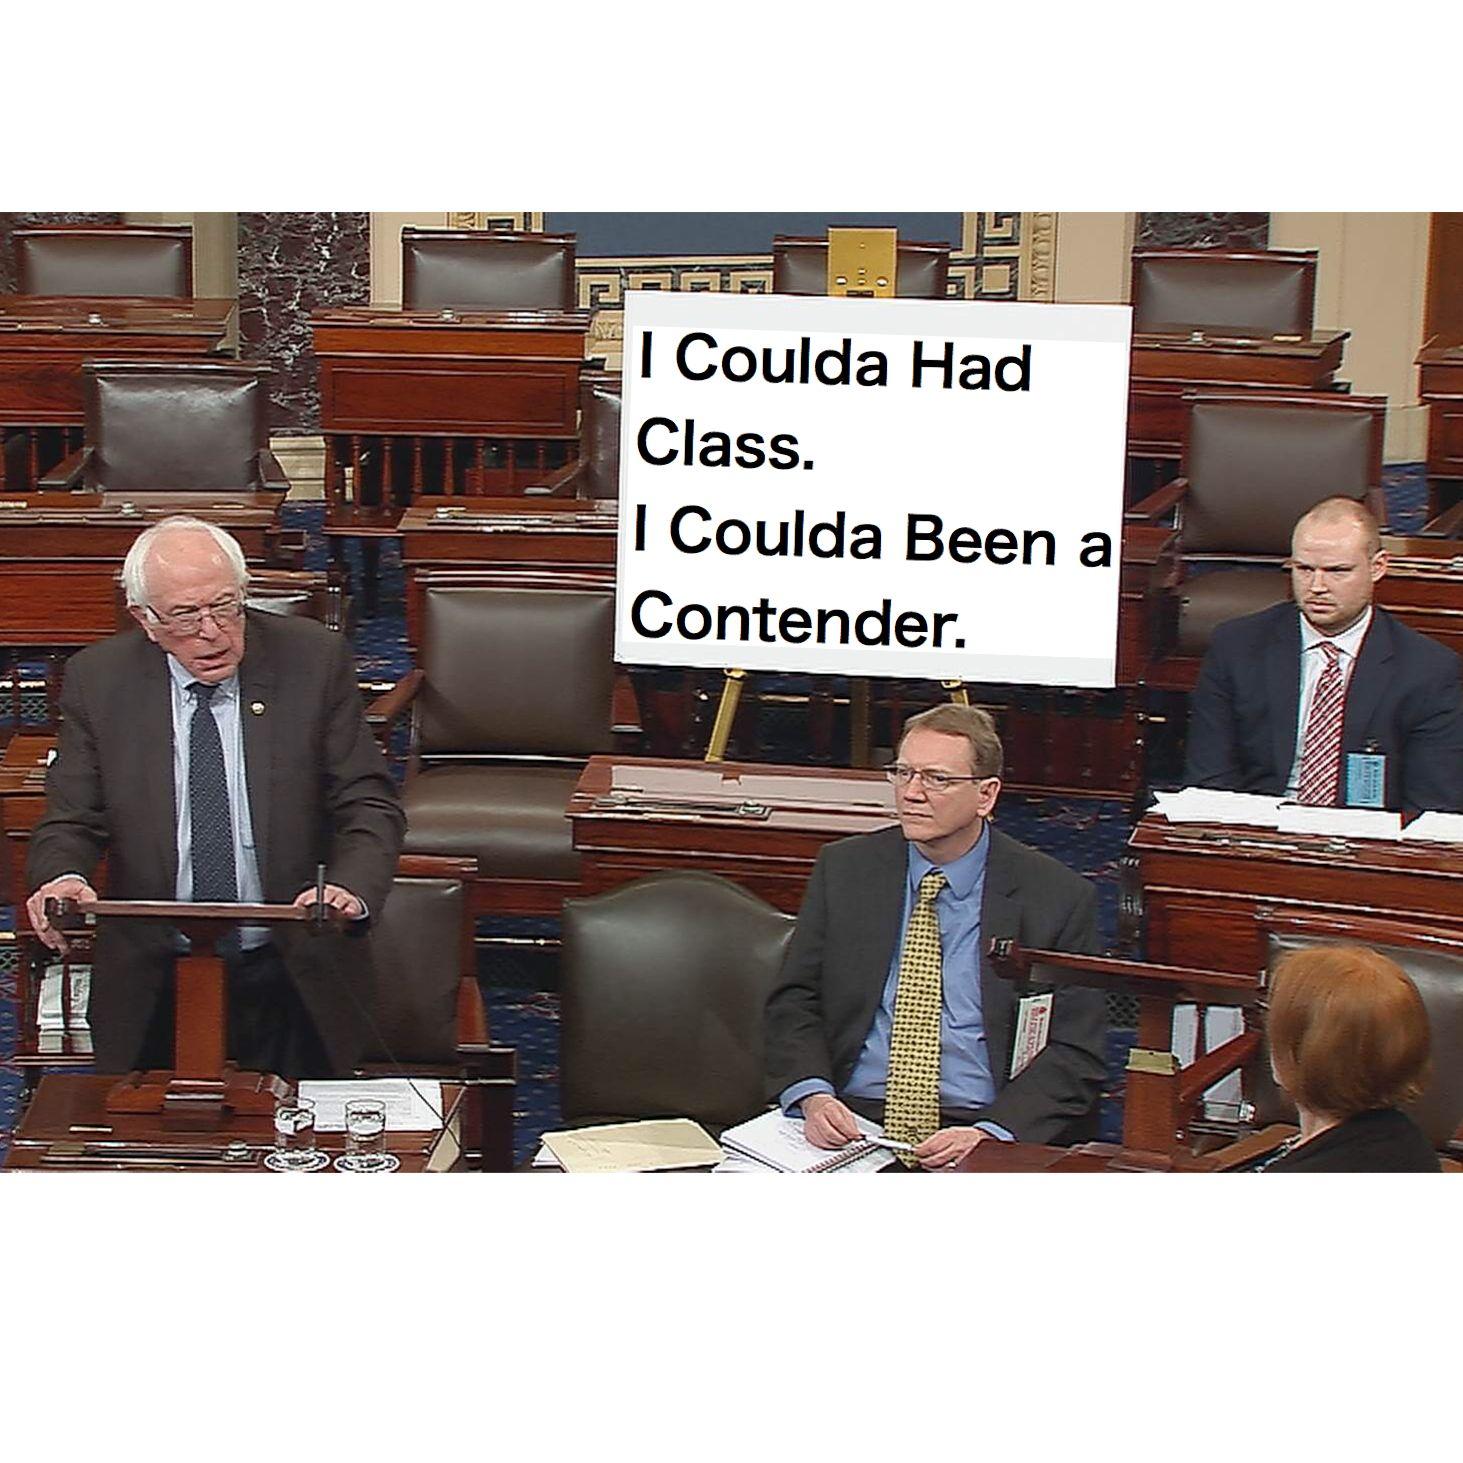 Meme Funny Humorous Bernie Sanders Congress Poster I Coulda Had